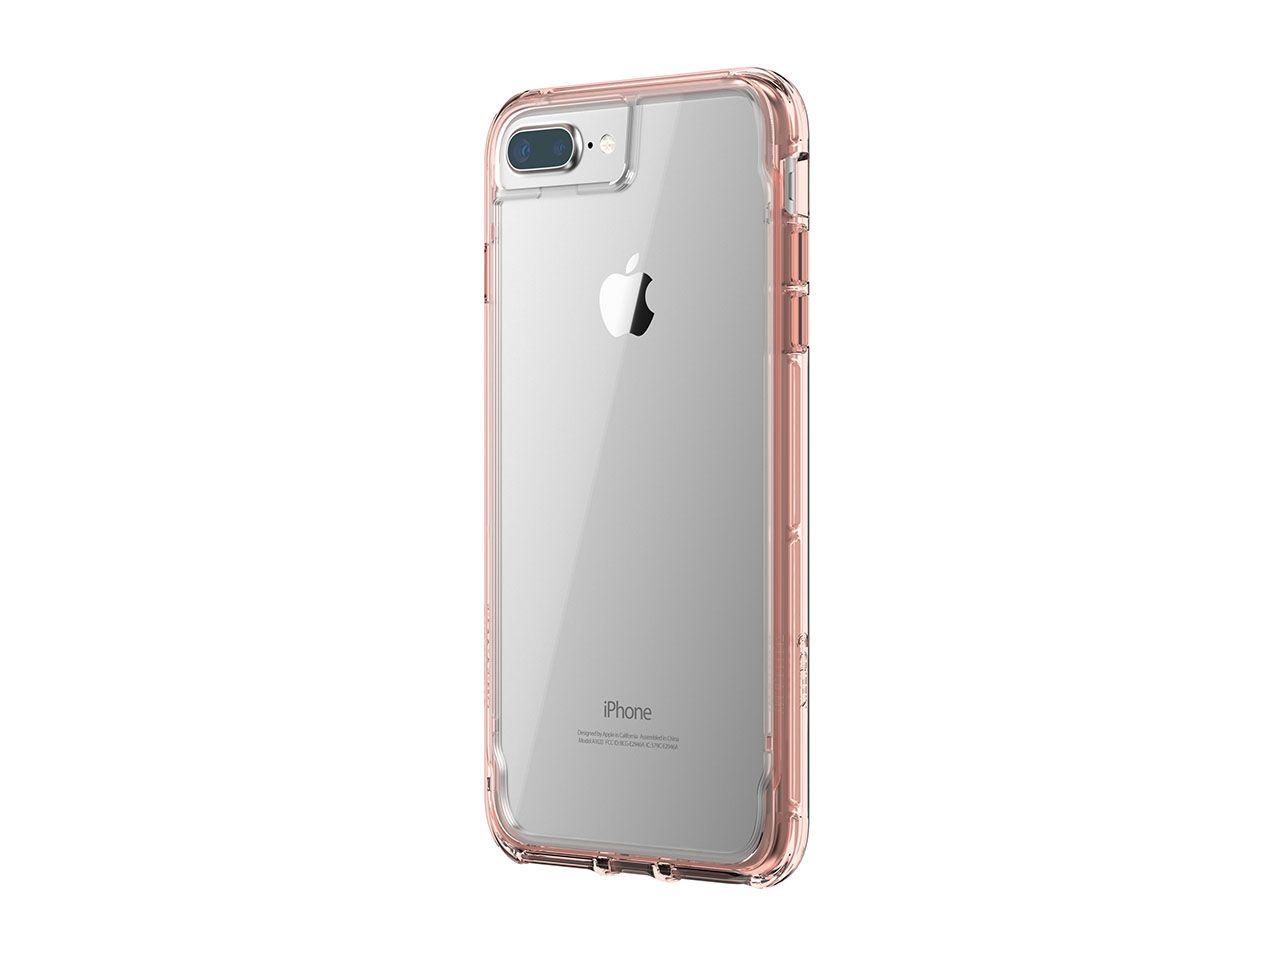 Griffin Survivor Case for iPhone 8 Plus, 7 Plus, 6s Plus, 6 Plus